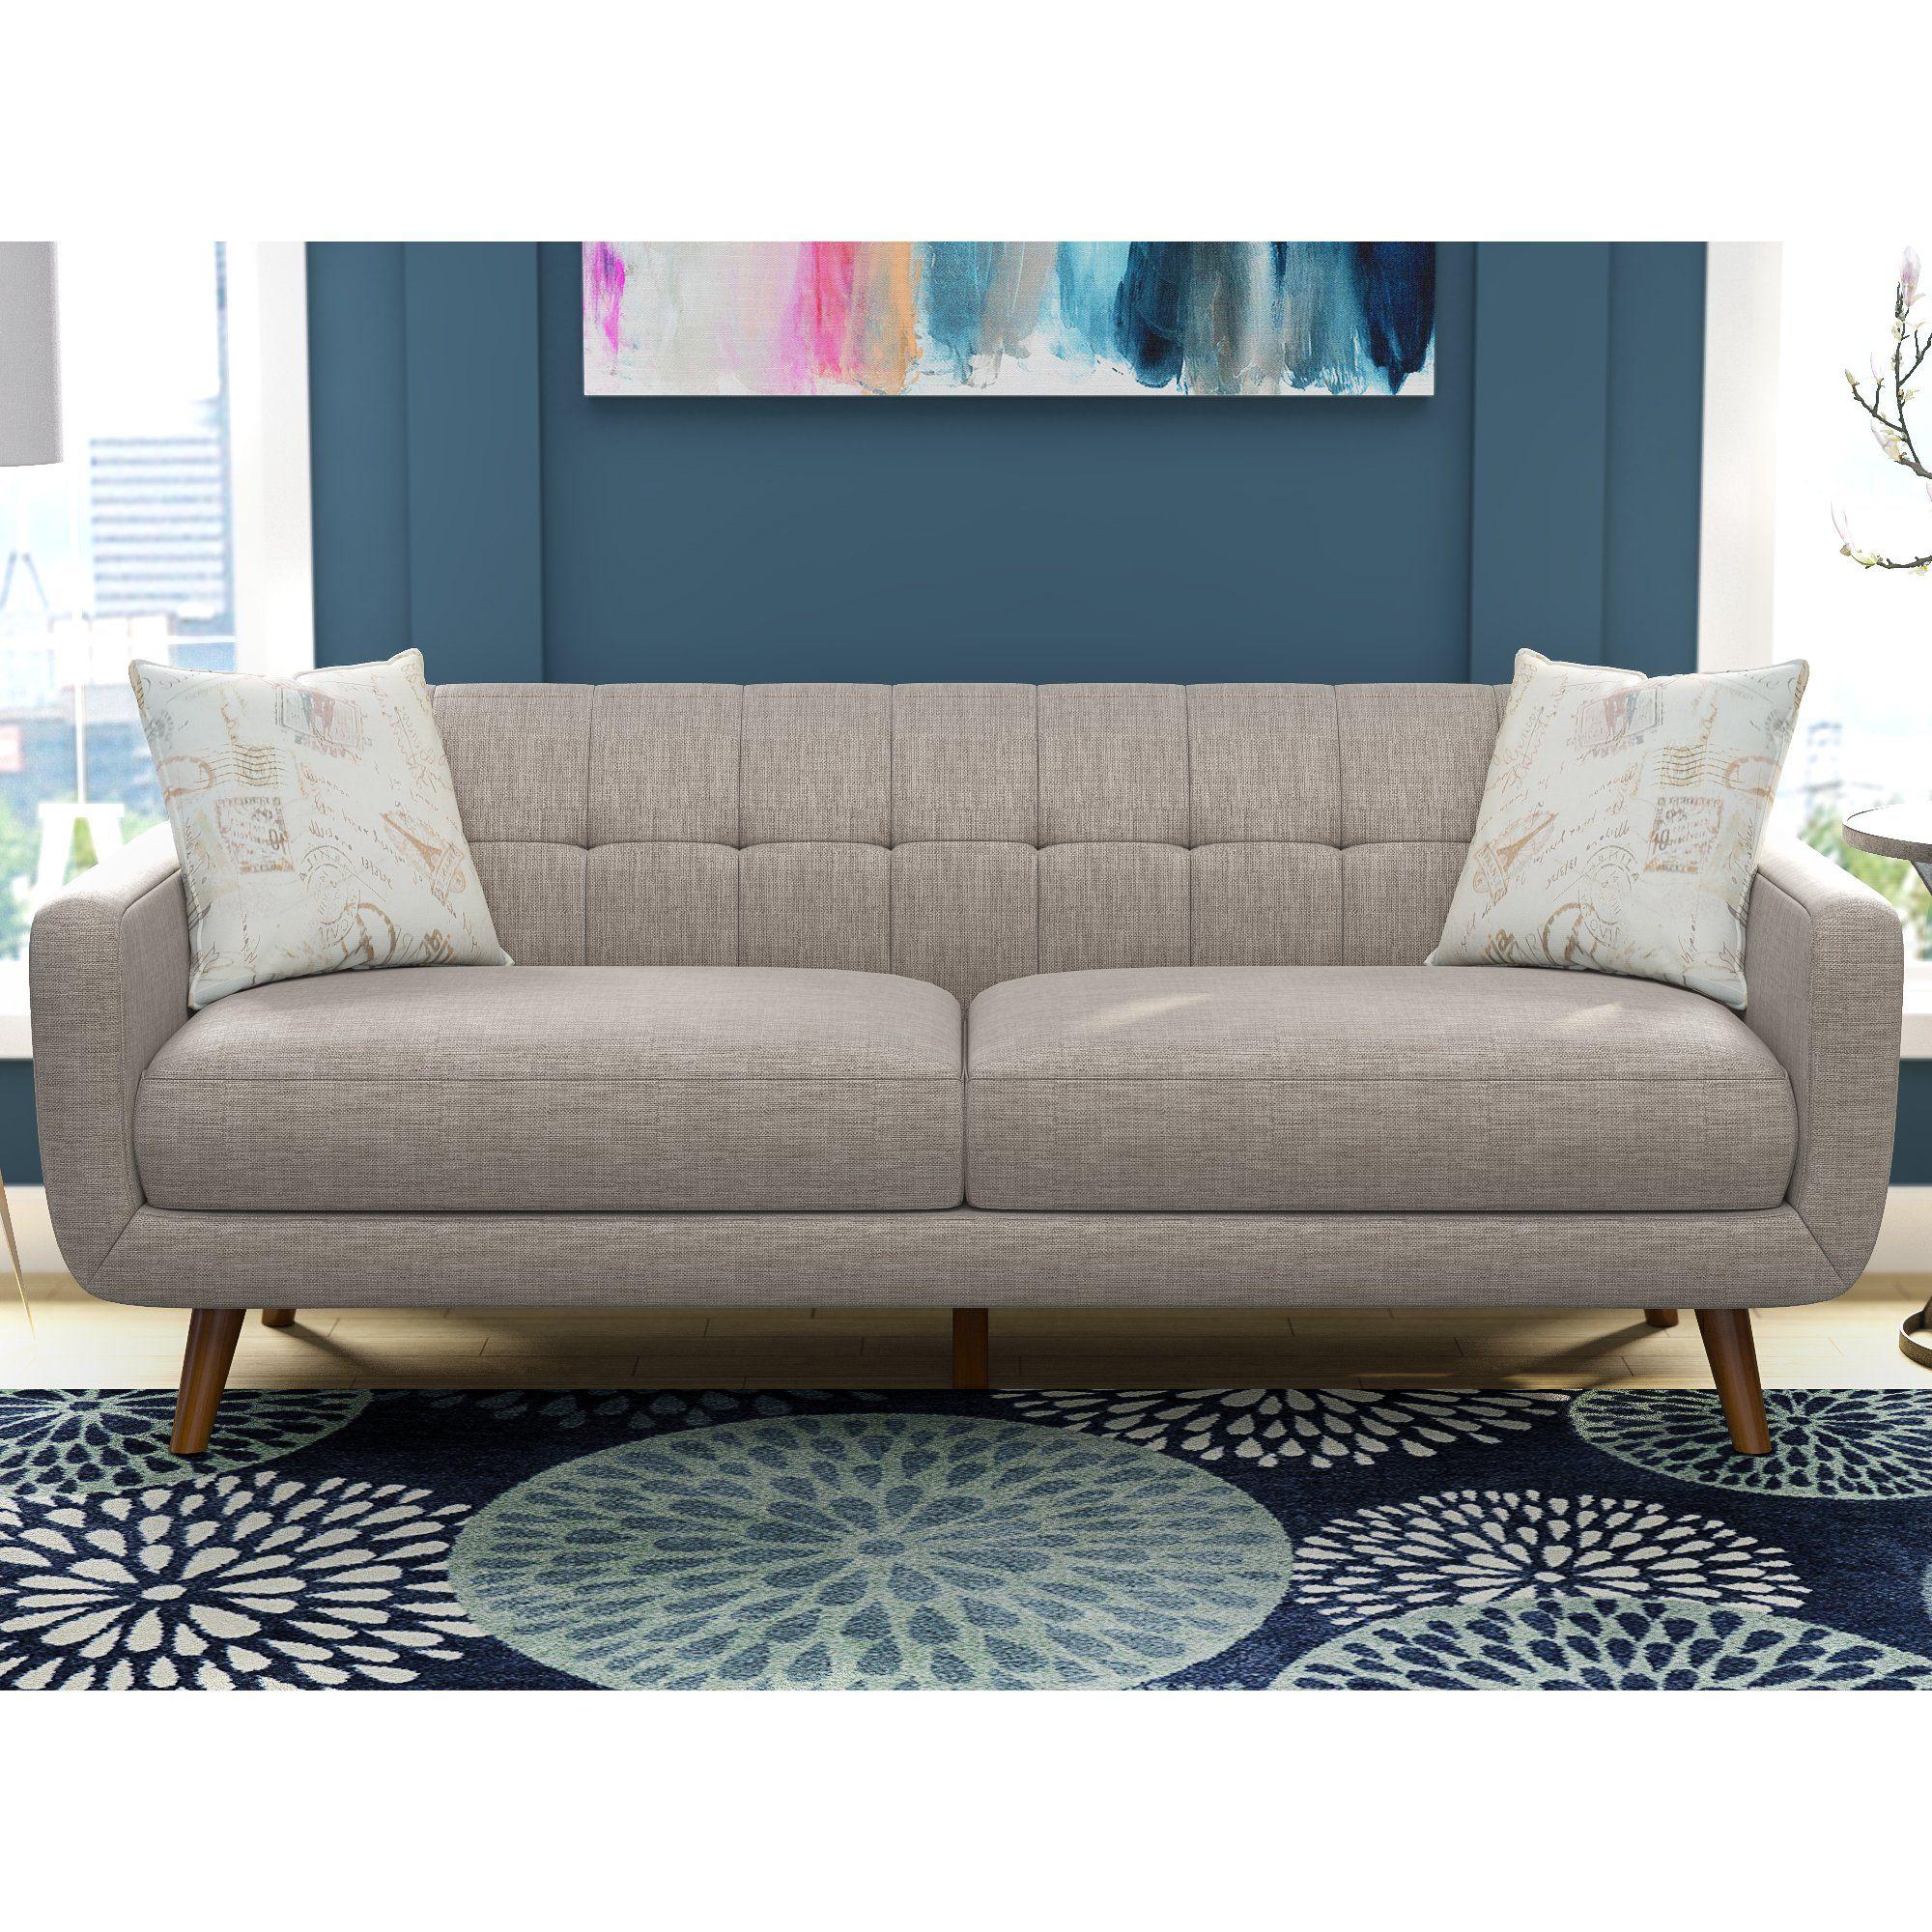 Latitude Run Mid Century Modern Sofa with accent pillows ...